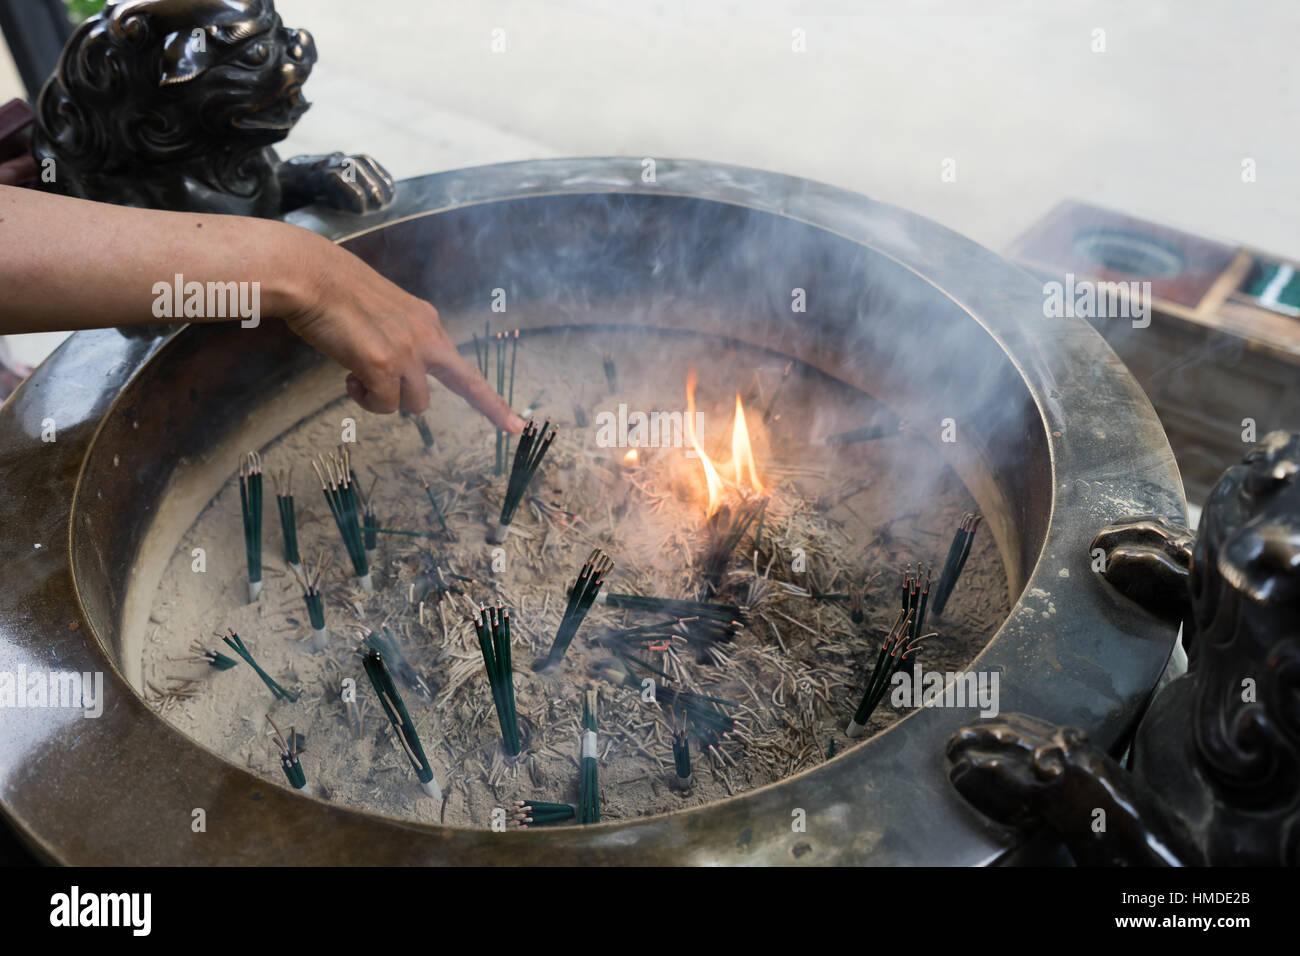 Japanese incense burner and burning incense sticks Stock